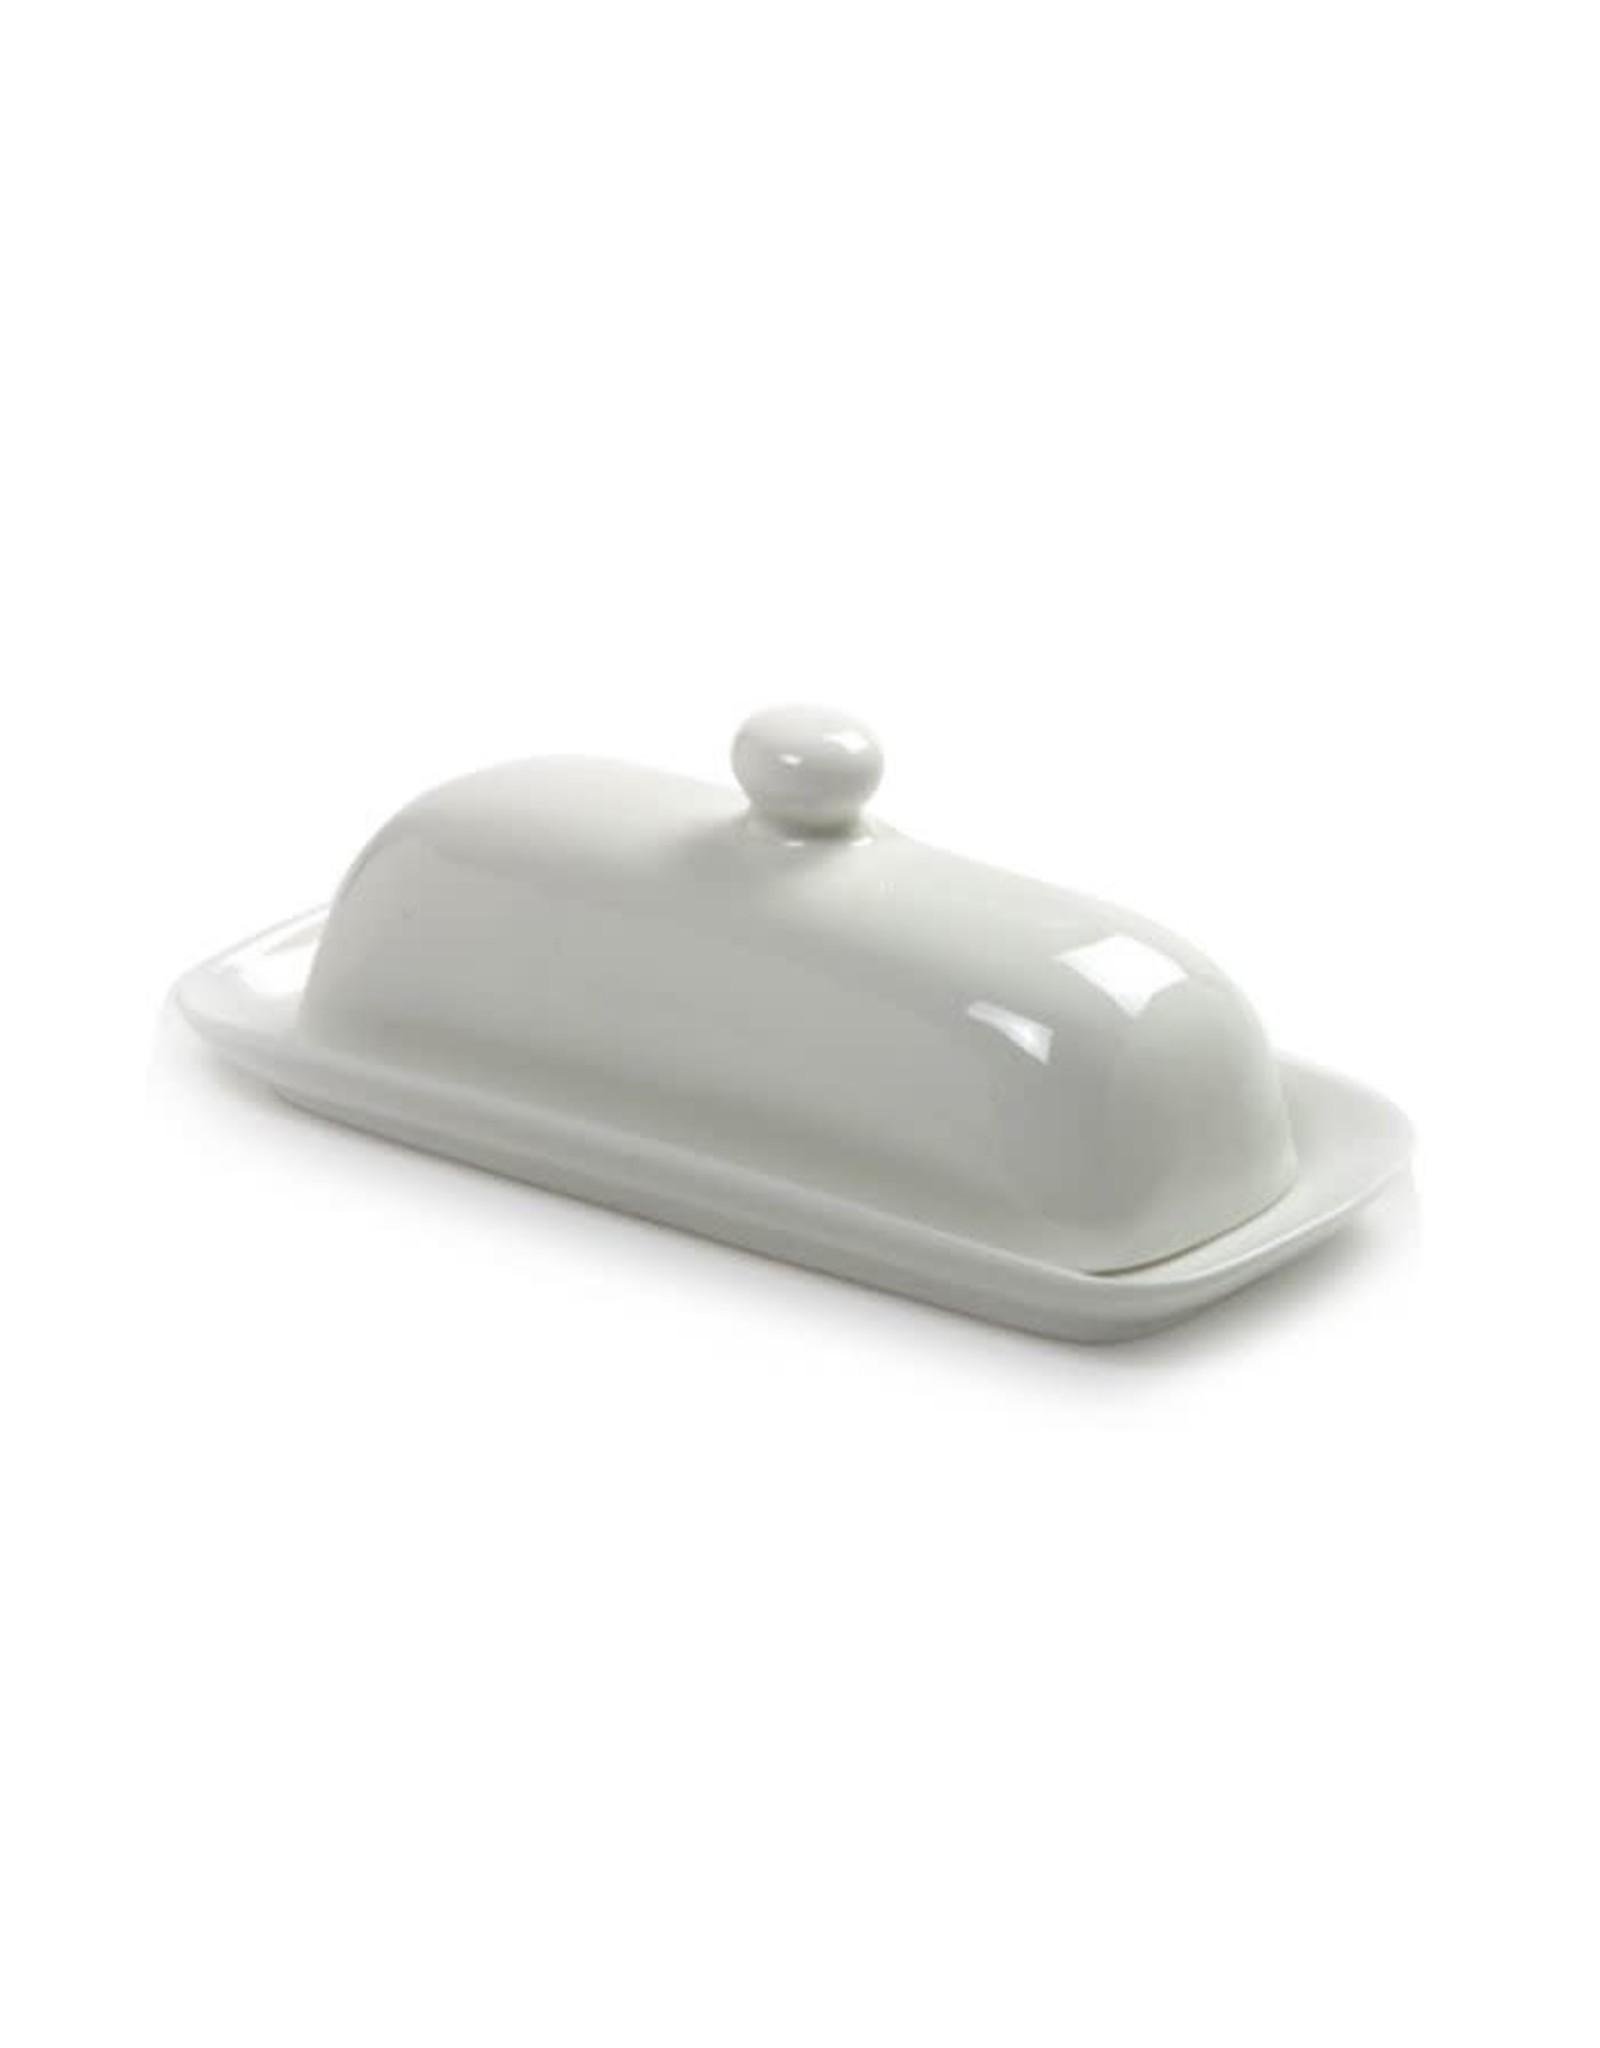 Norpro Porcelain Butter Dish w/Lid, White